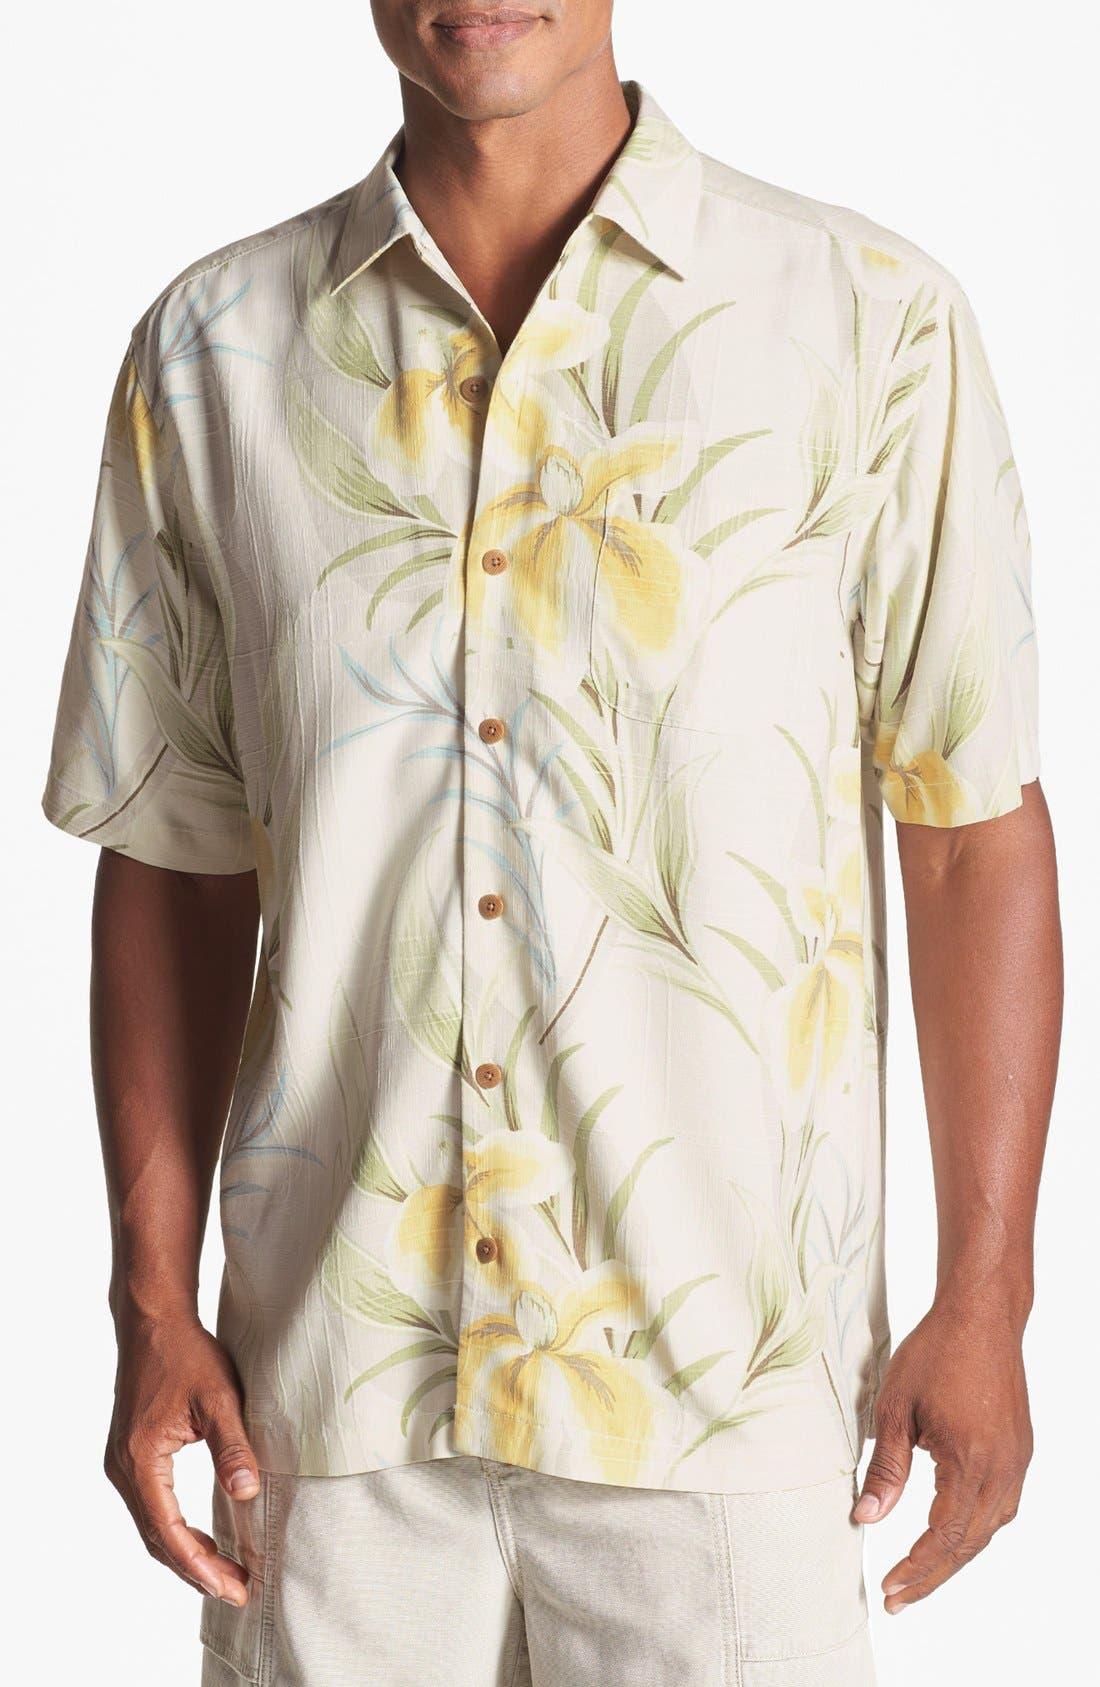 Main Image - Tommy Bahama 'Iris You Were Here' Silk Campshirt